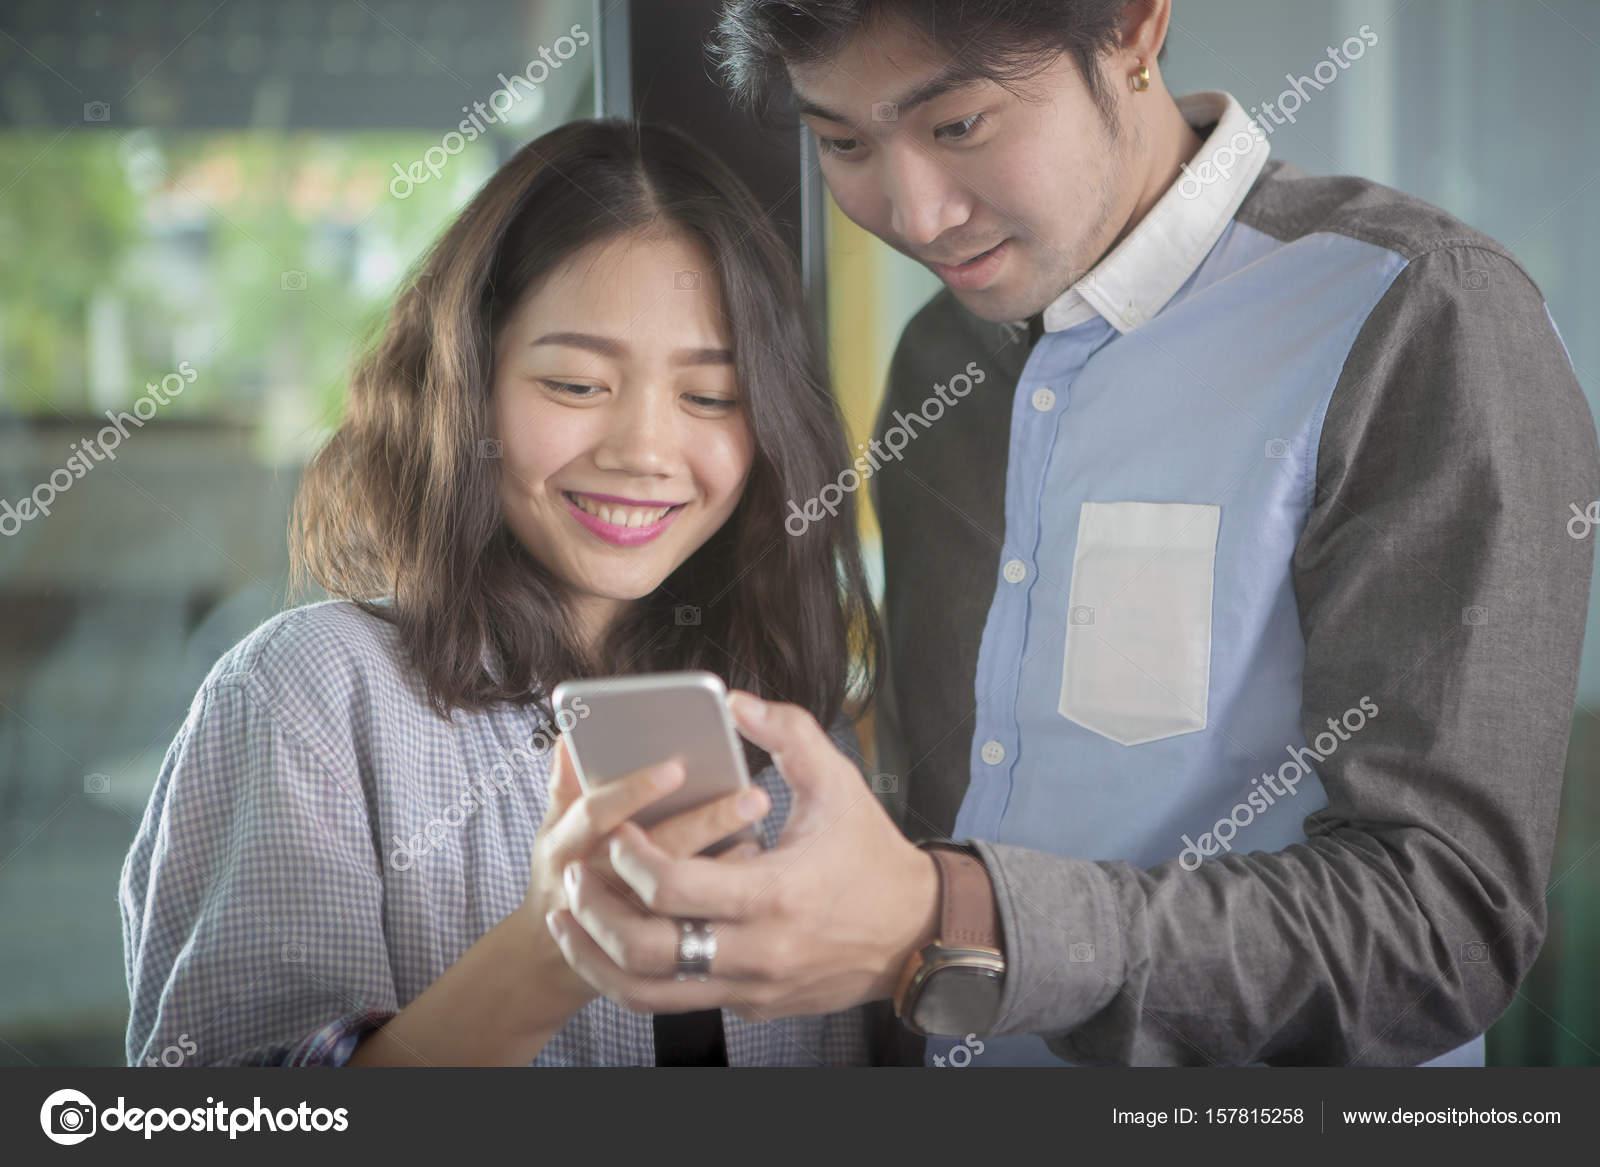 pity, that now apothekerin flirten even more cheerfully think